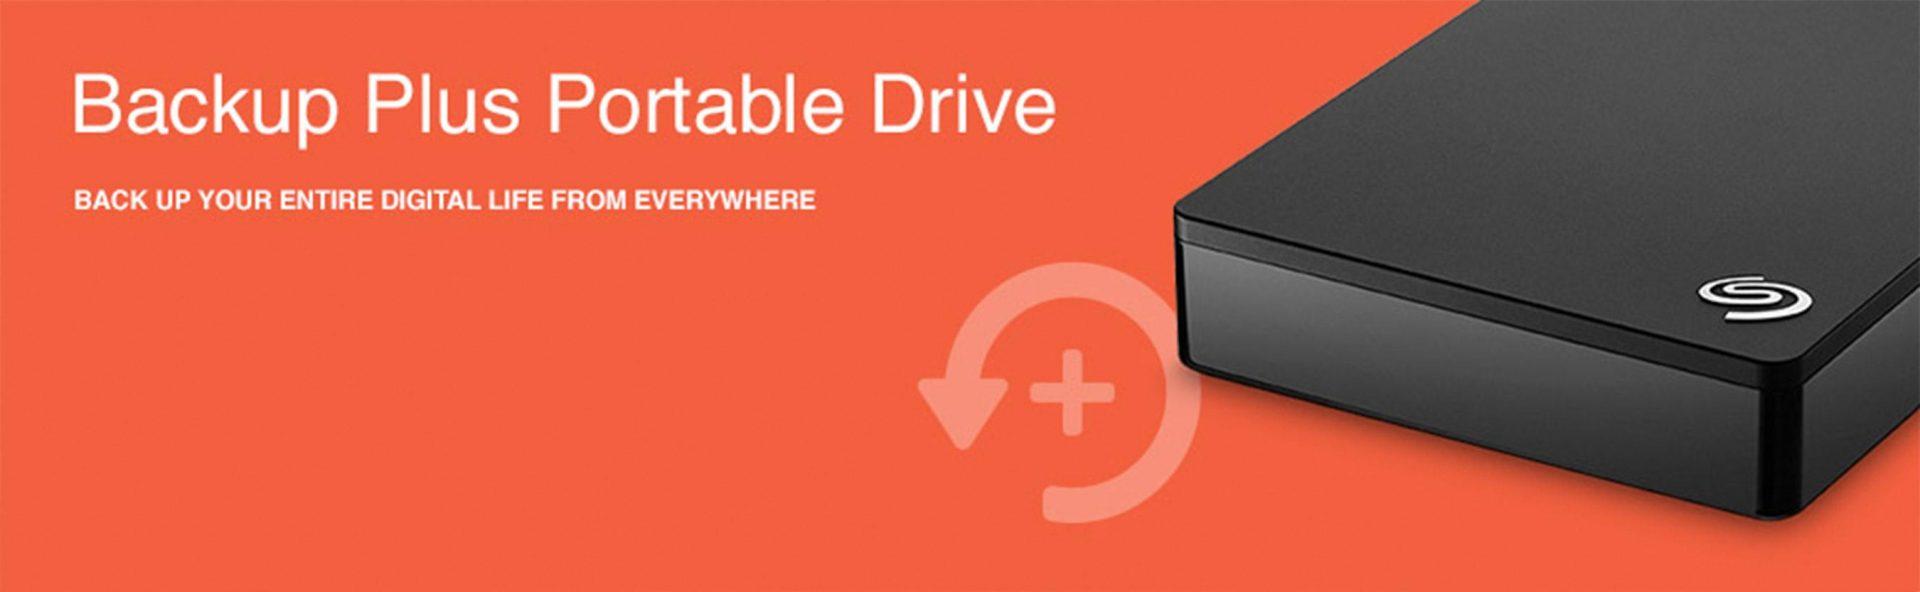 Seagate Backup Plus 5TB Portable External Hard Drive USB 3.0